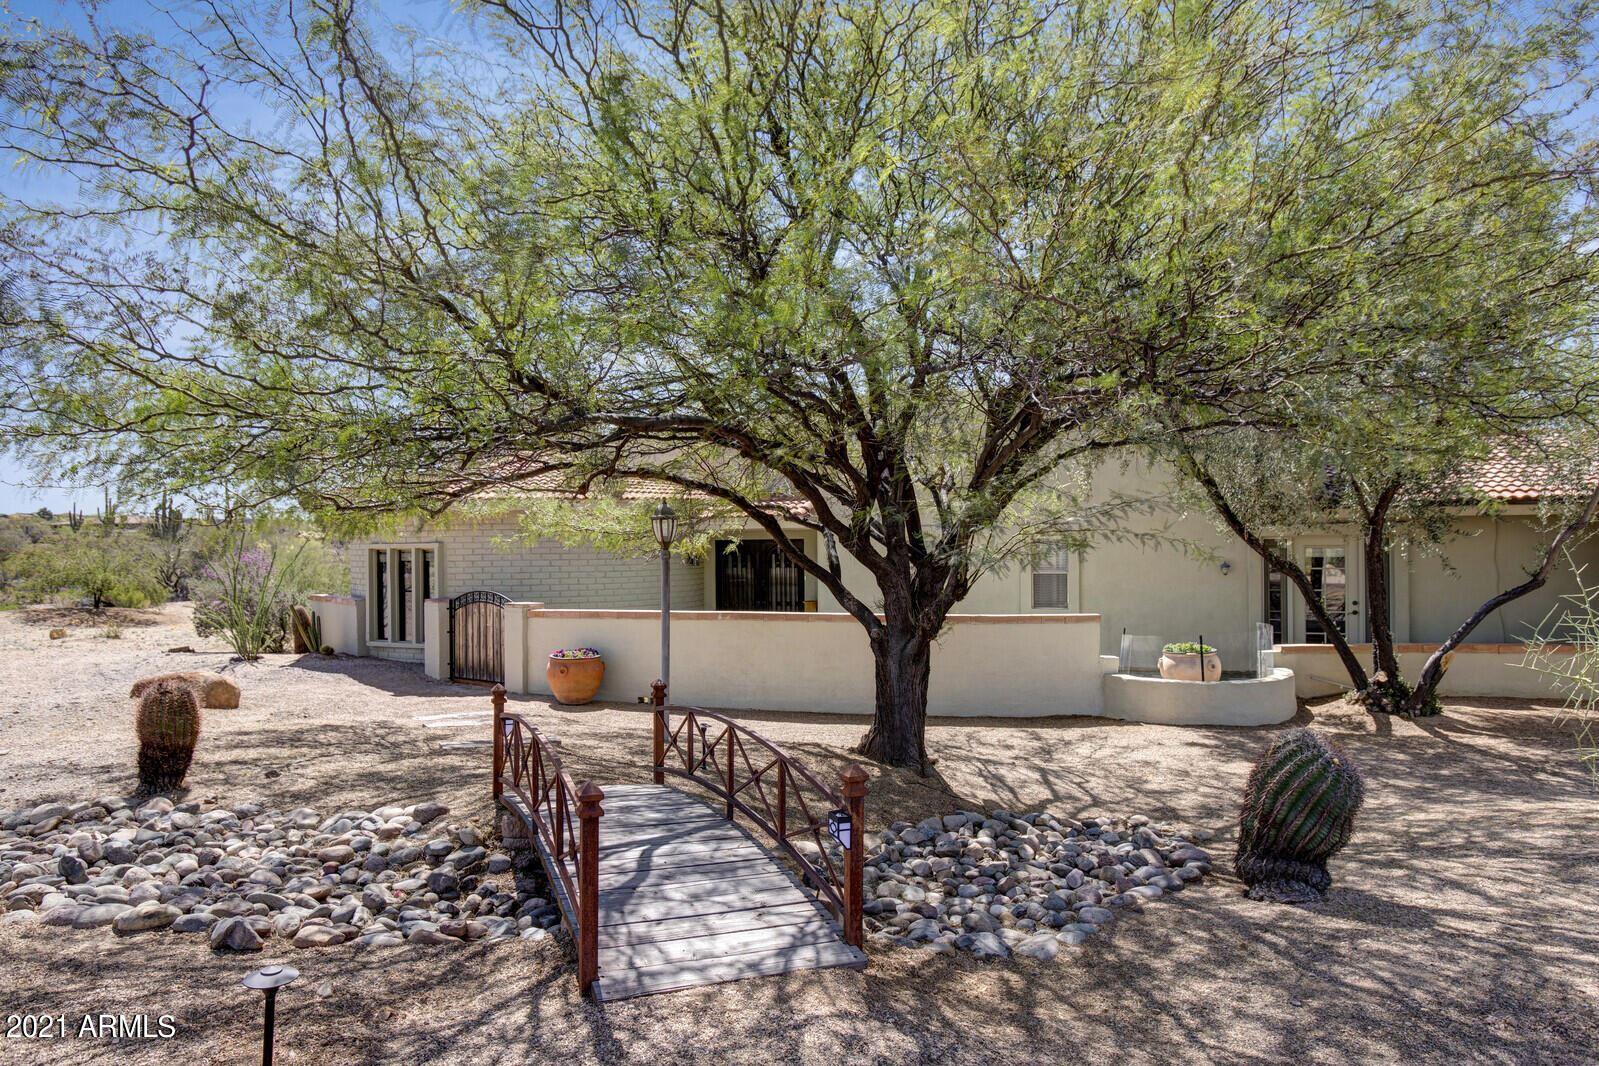 36633 N STARDUST Lane, Carefree, AZ 85377 - MLS#: 6231802